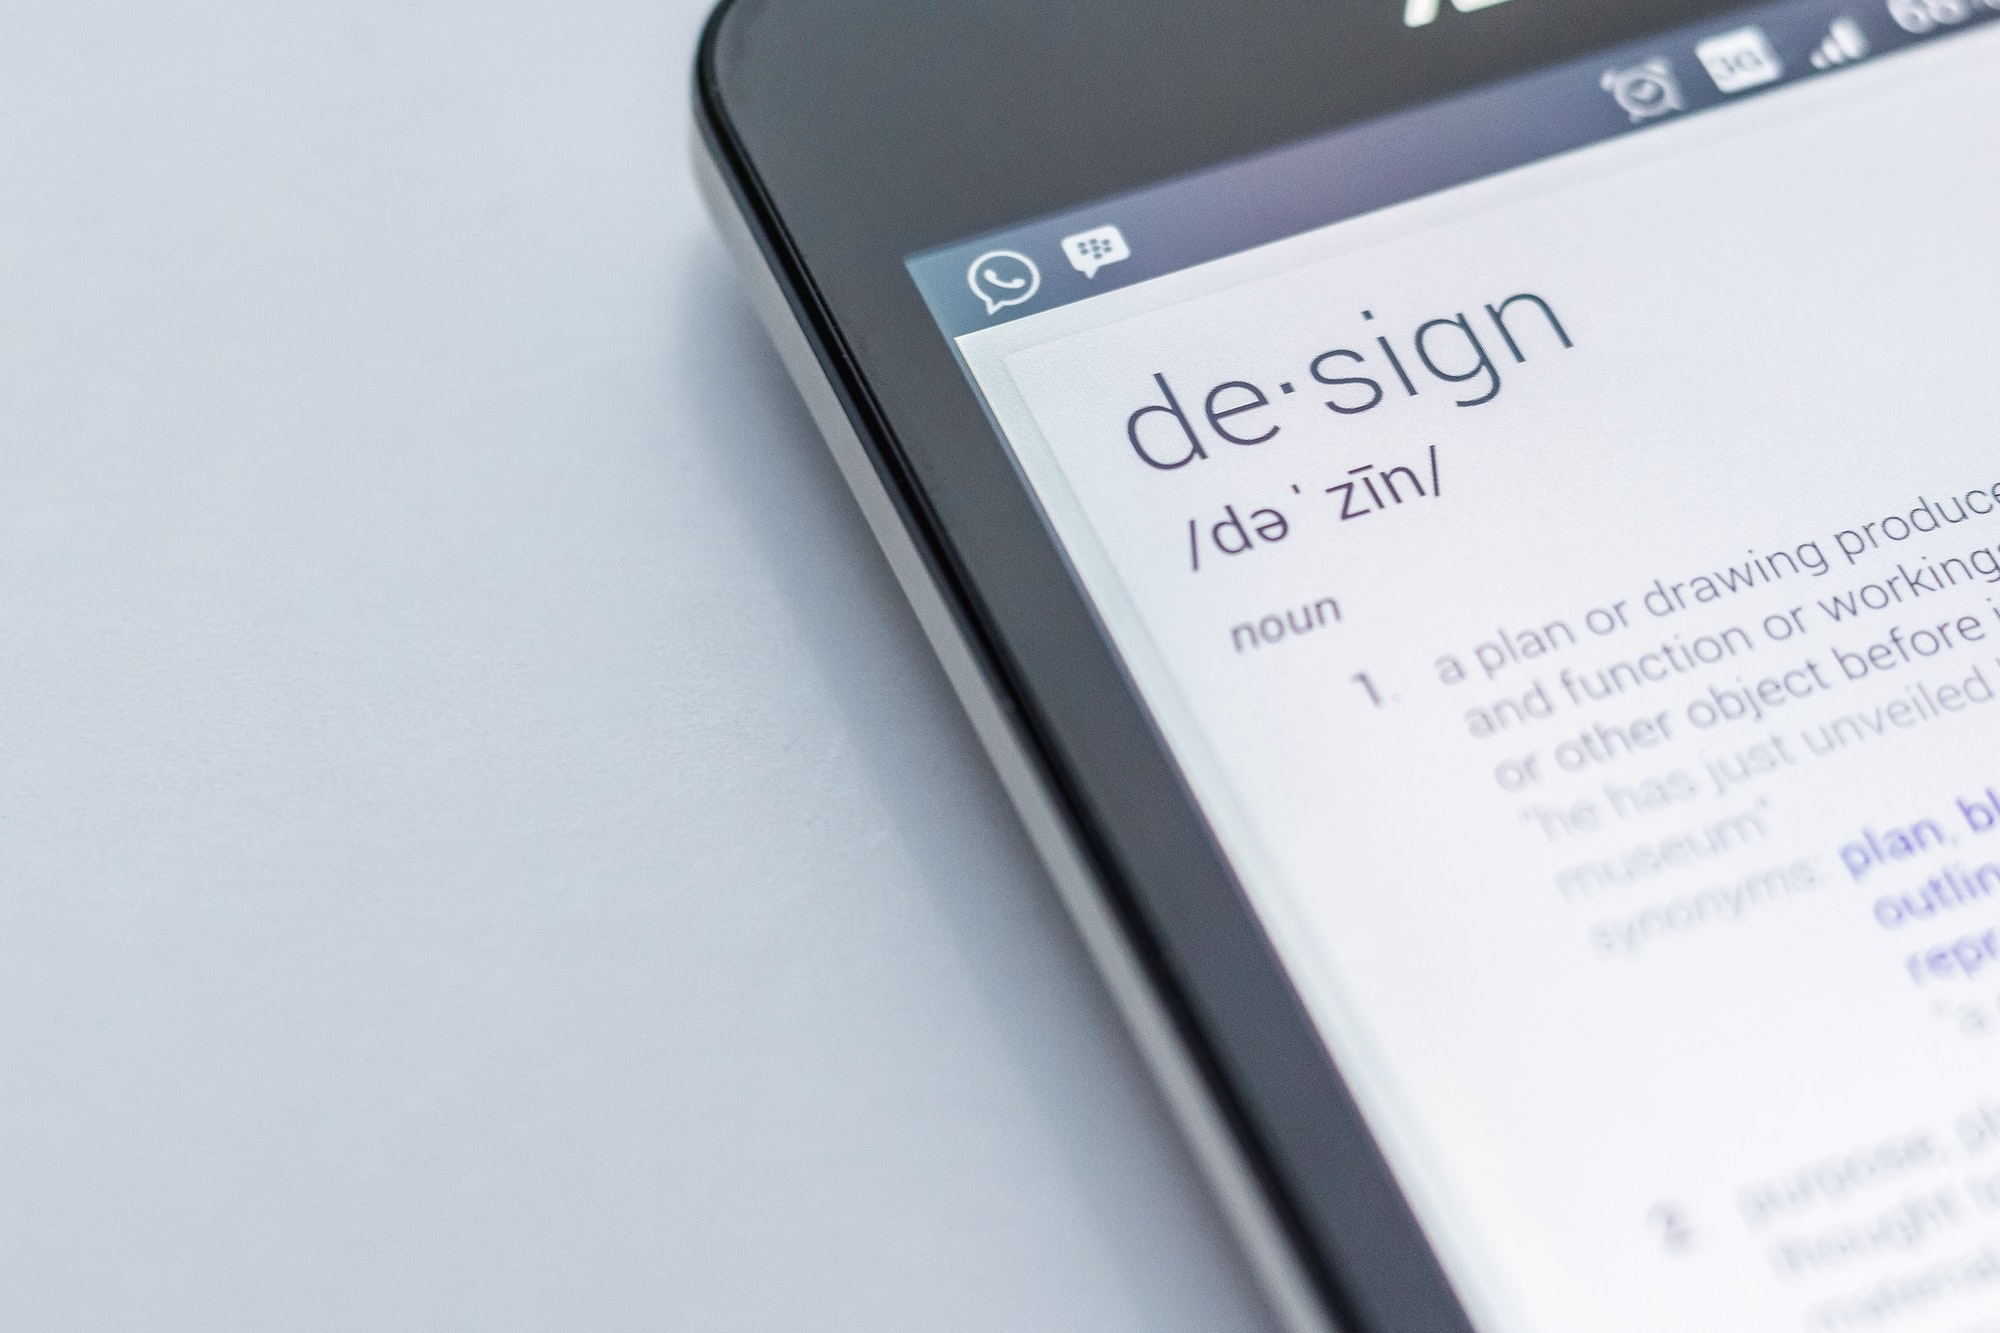 Design smartphone definition